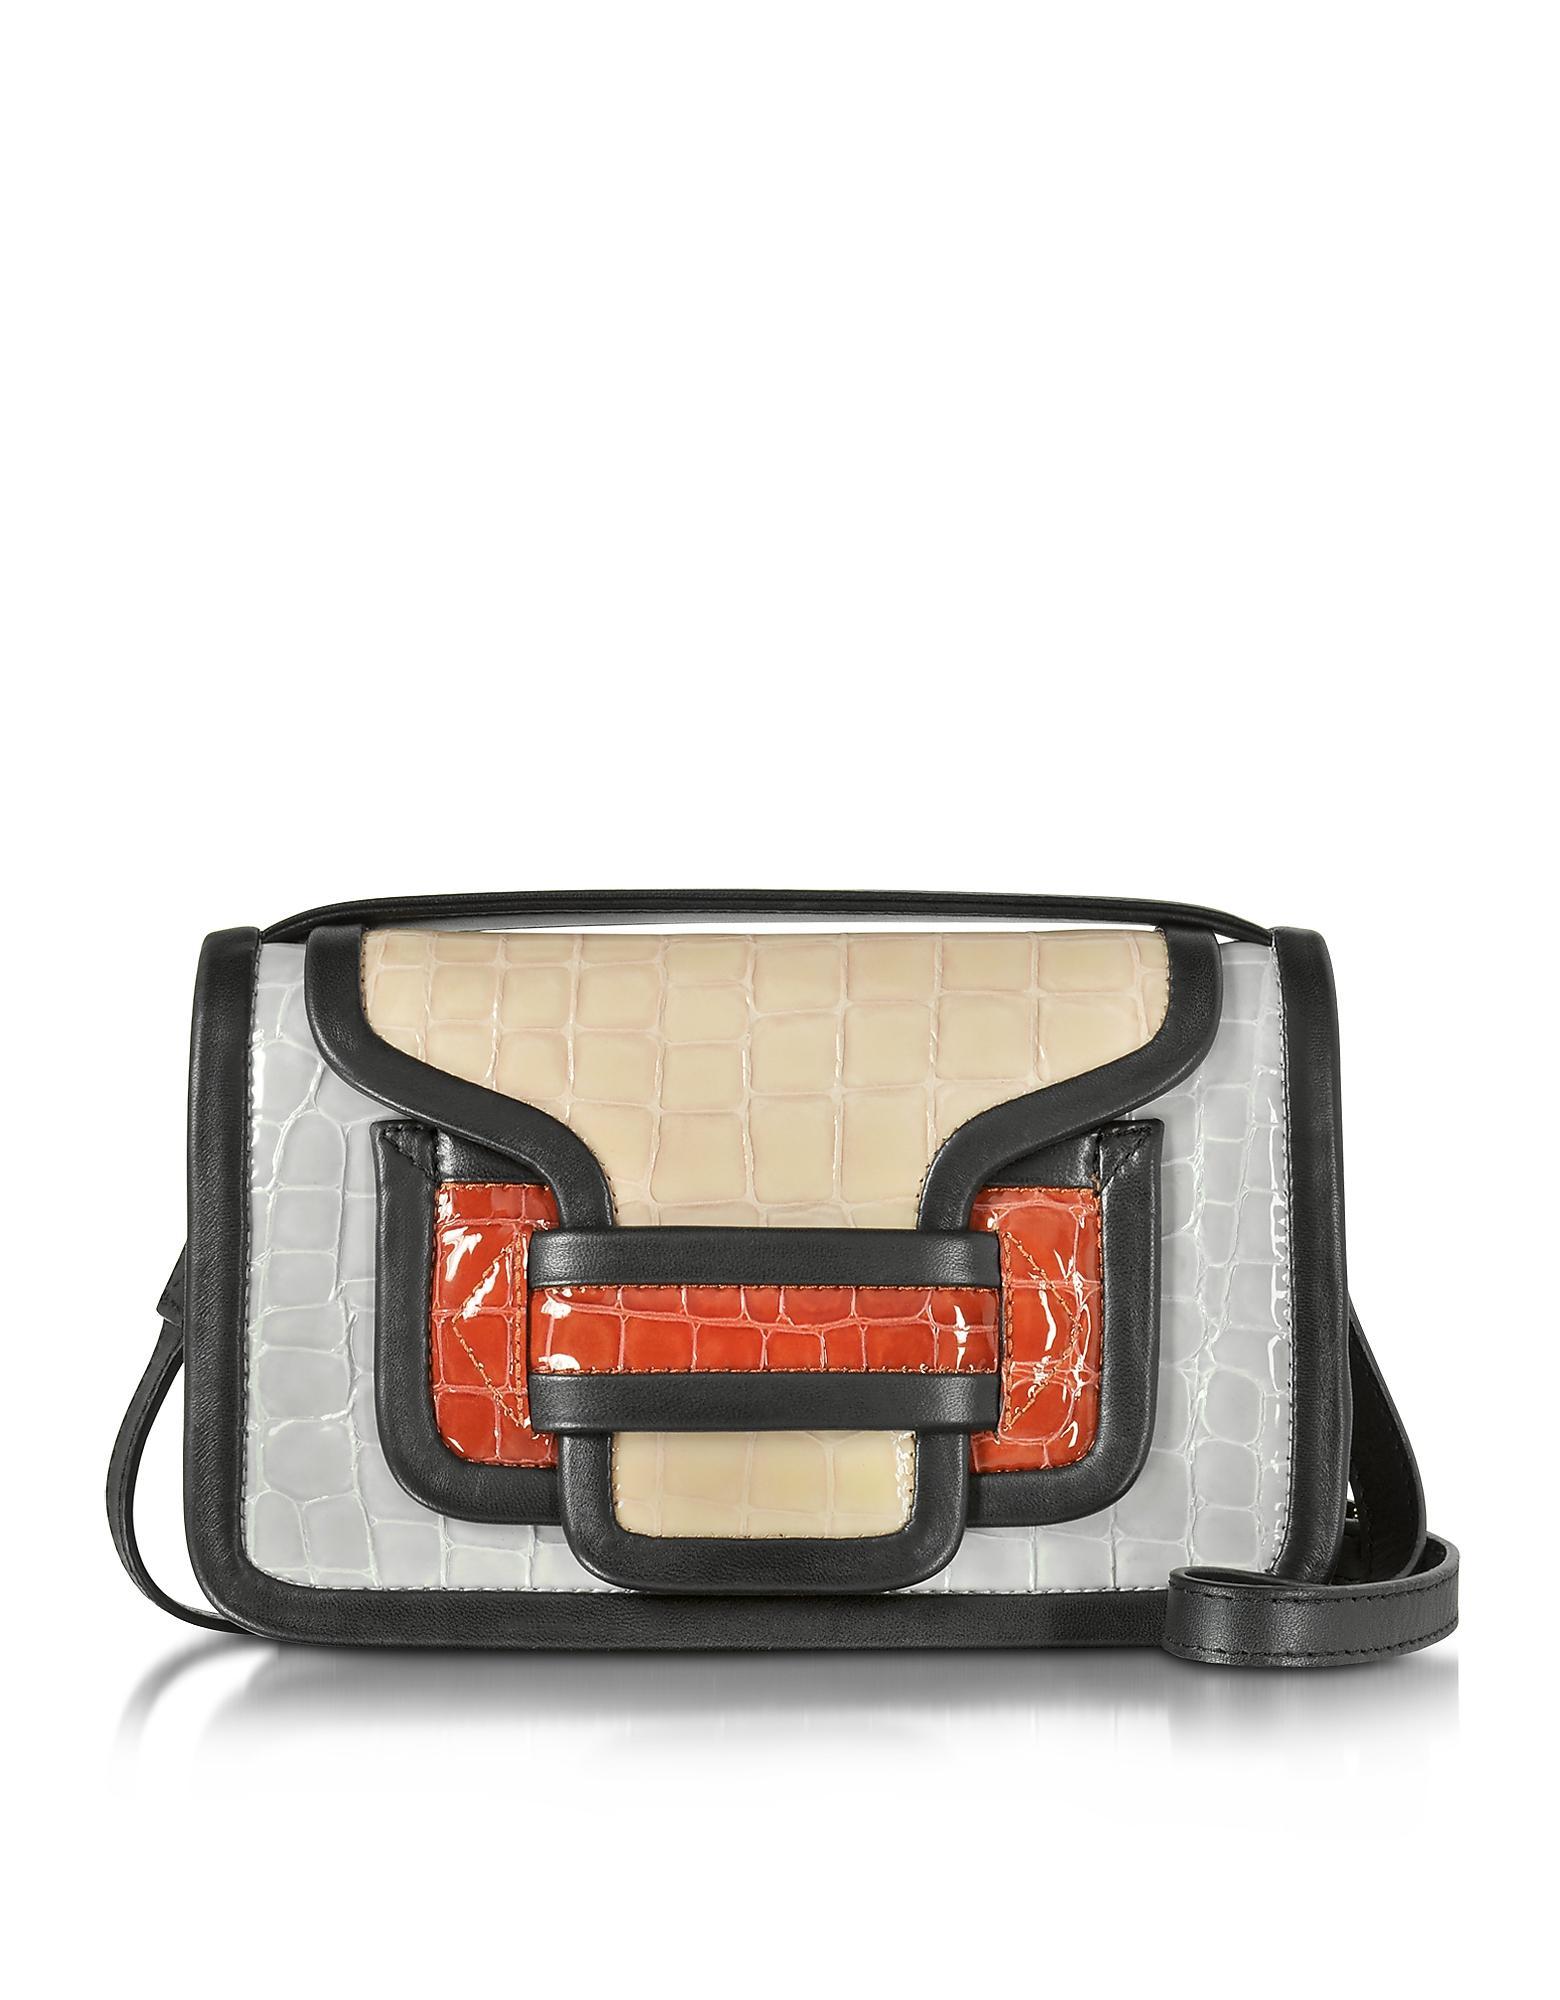 Dkny Patent Croco Crossbody Bag 58